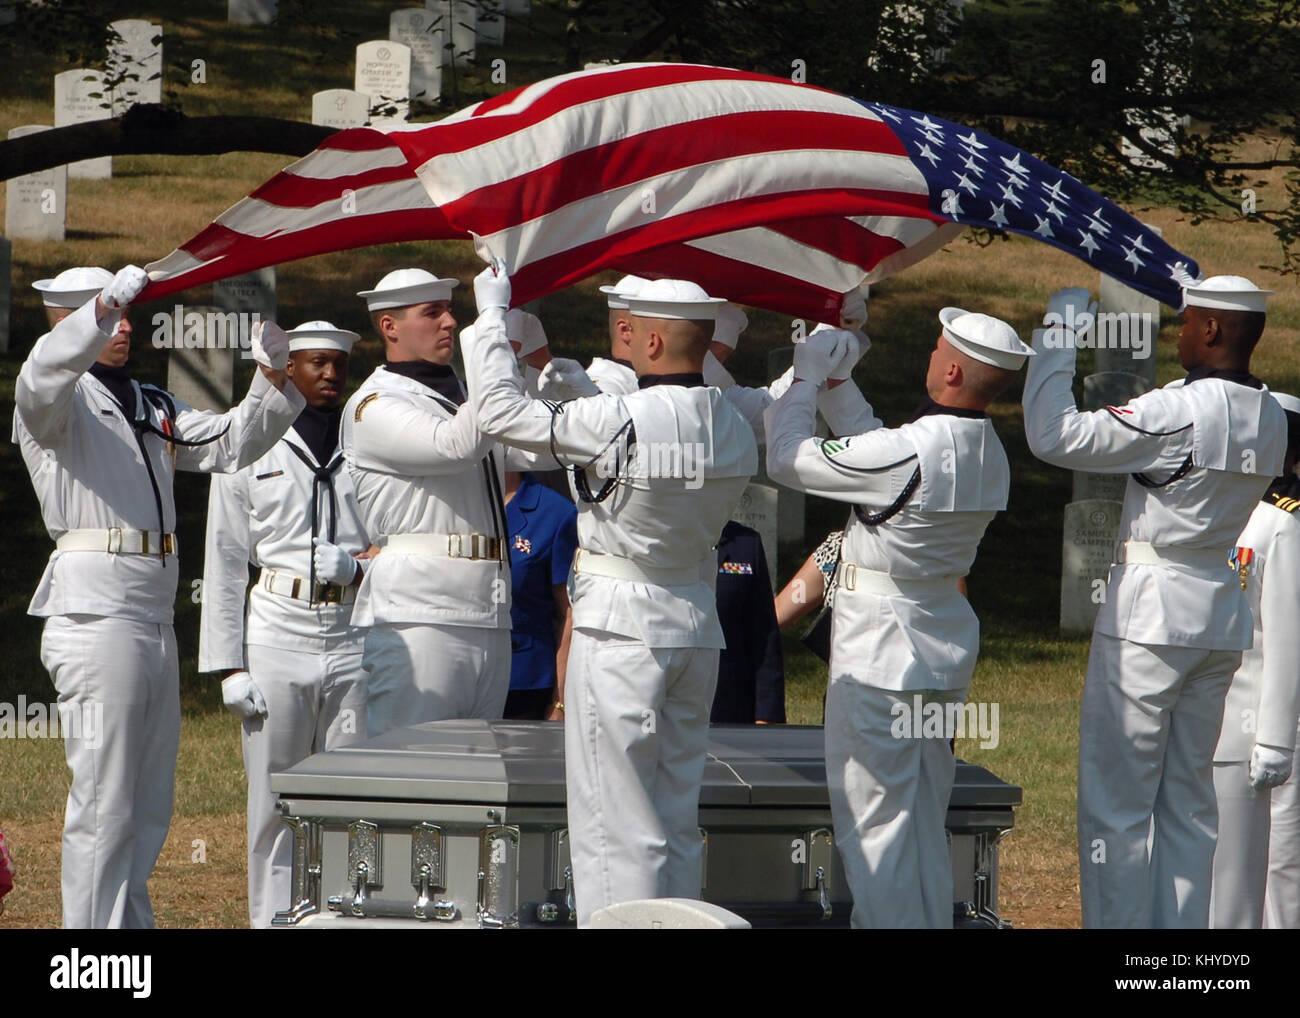 U S Navy Ceremonial Guard Stock Photos U S Navy Ceremonial Guard - Us-navy-ceremonial-guard